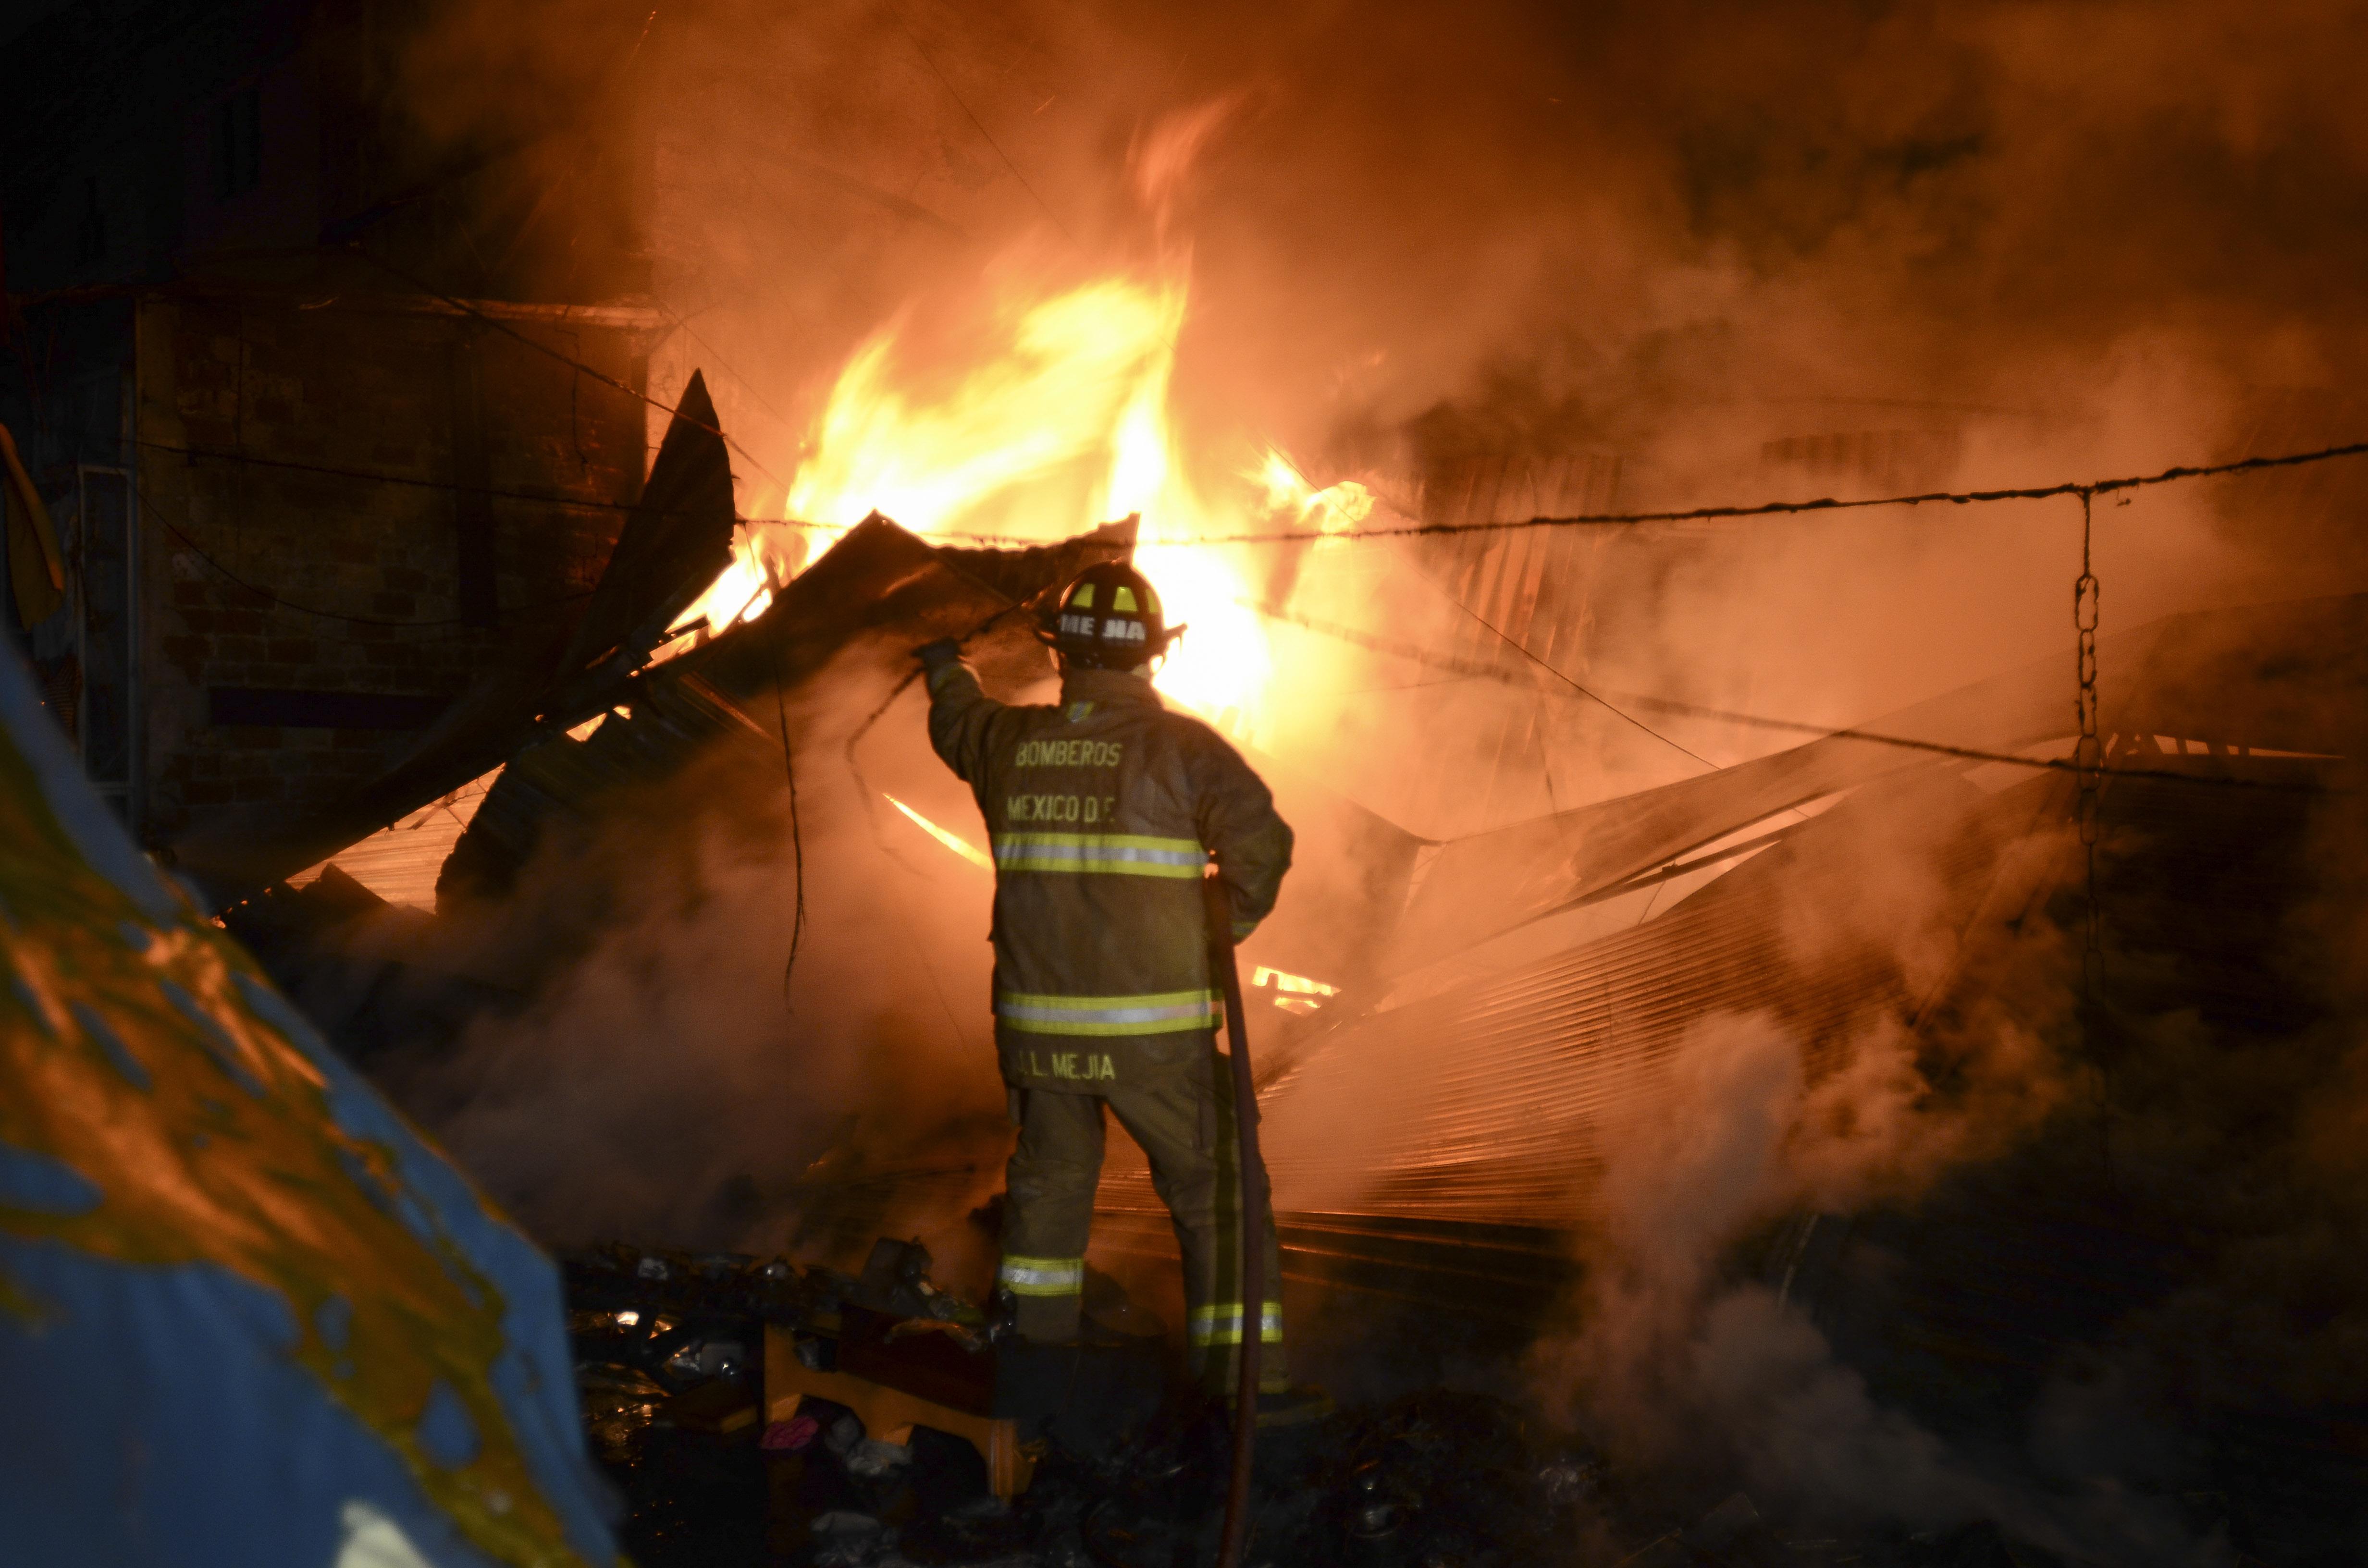 Se incendia una bodega y evacúan a diez familias en Iztapalapa